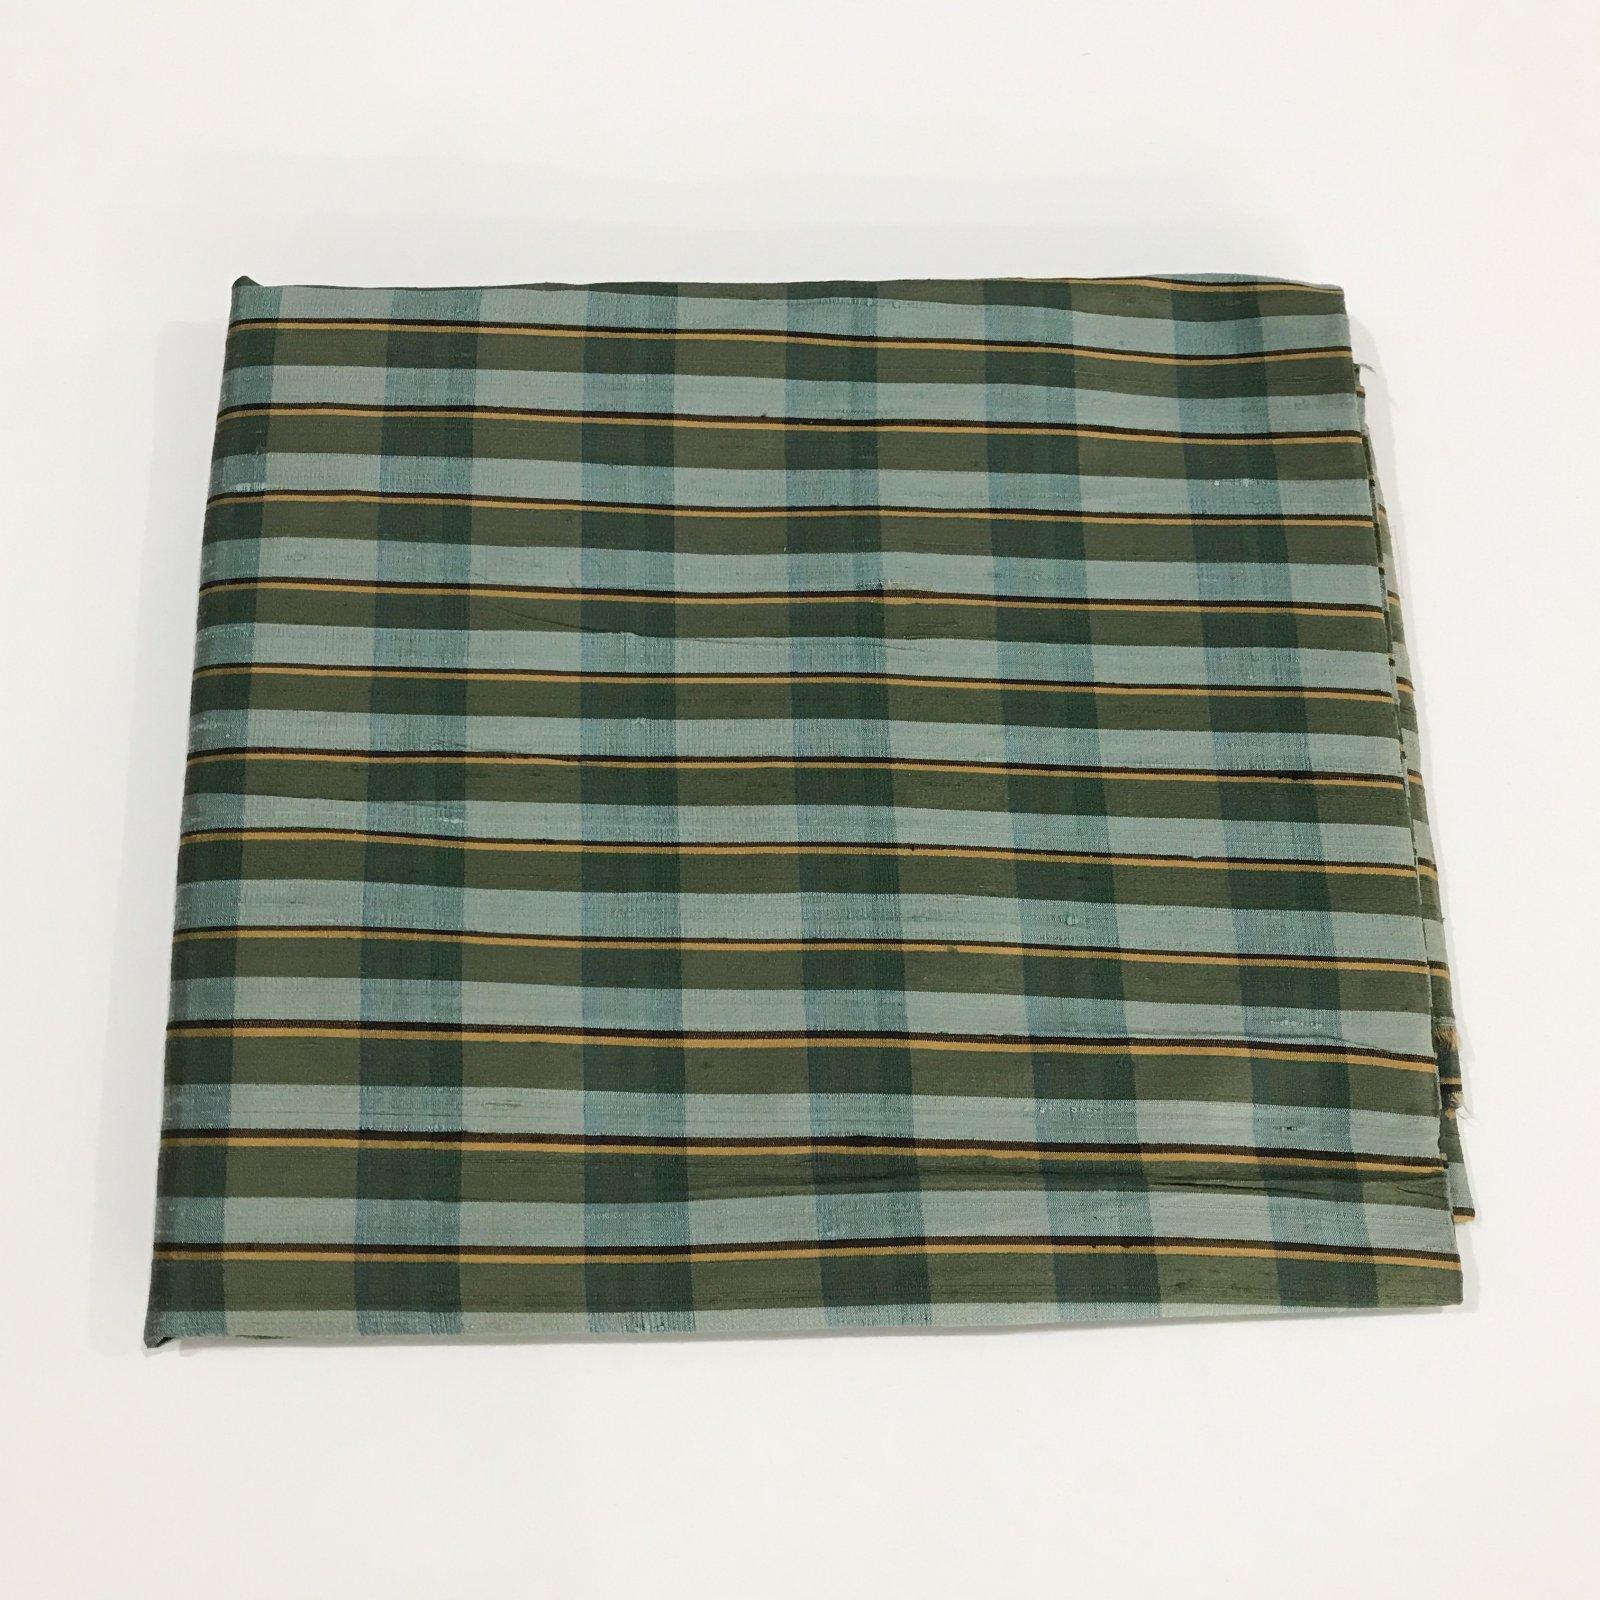 2 yards + 4 inches - Silk Dupioni- Green Tones